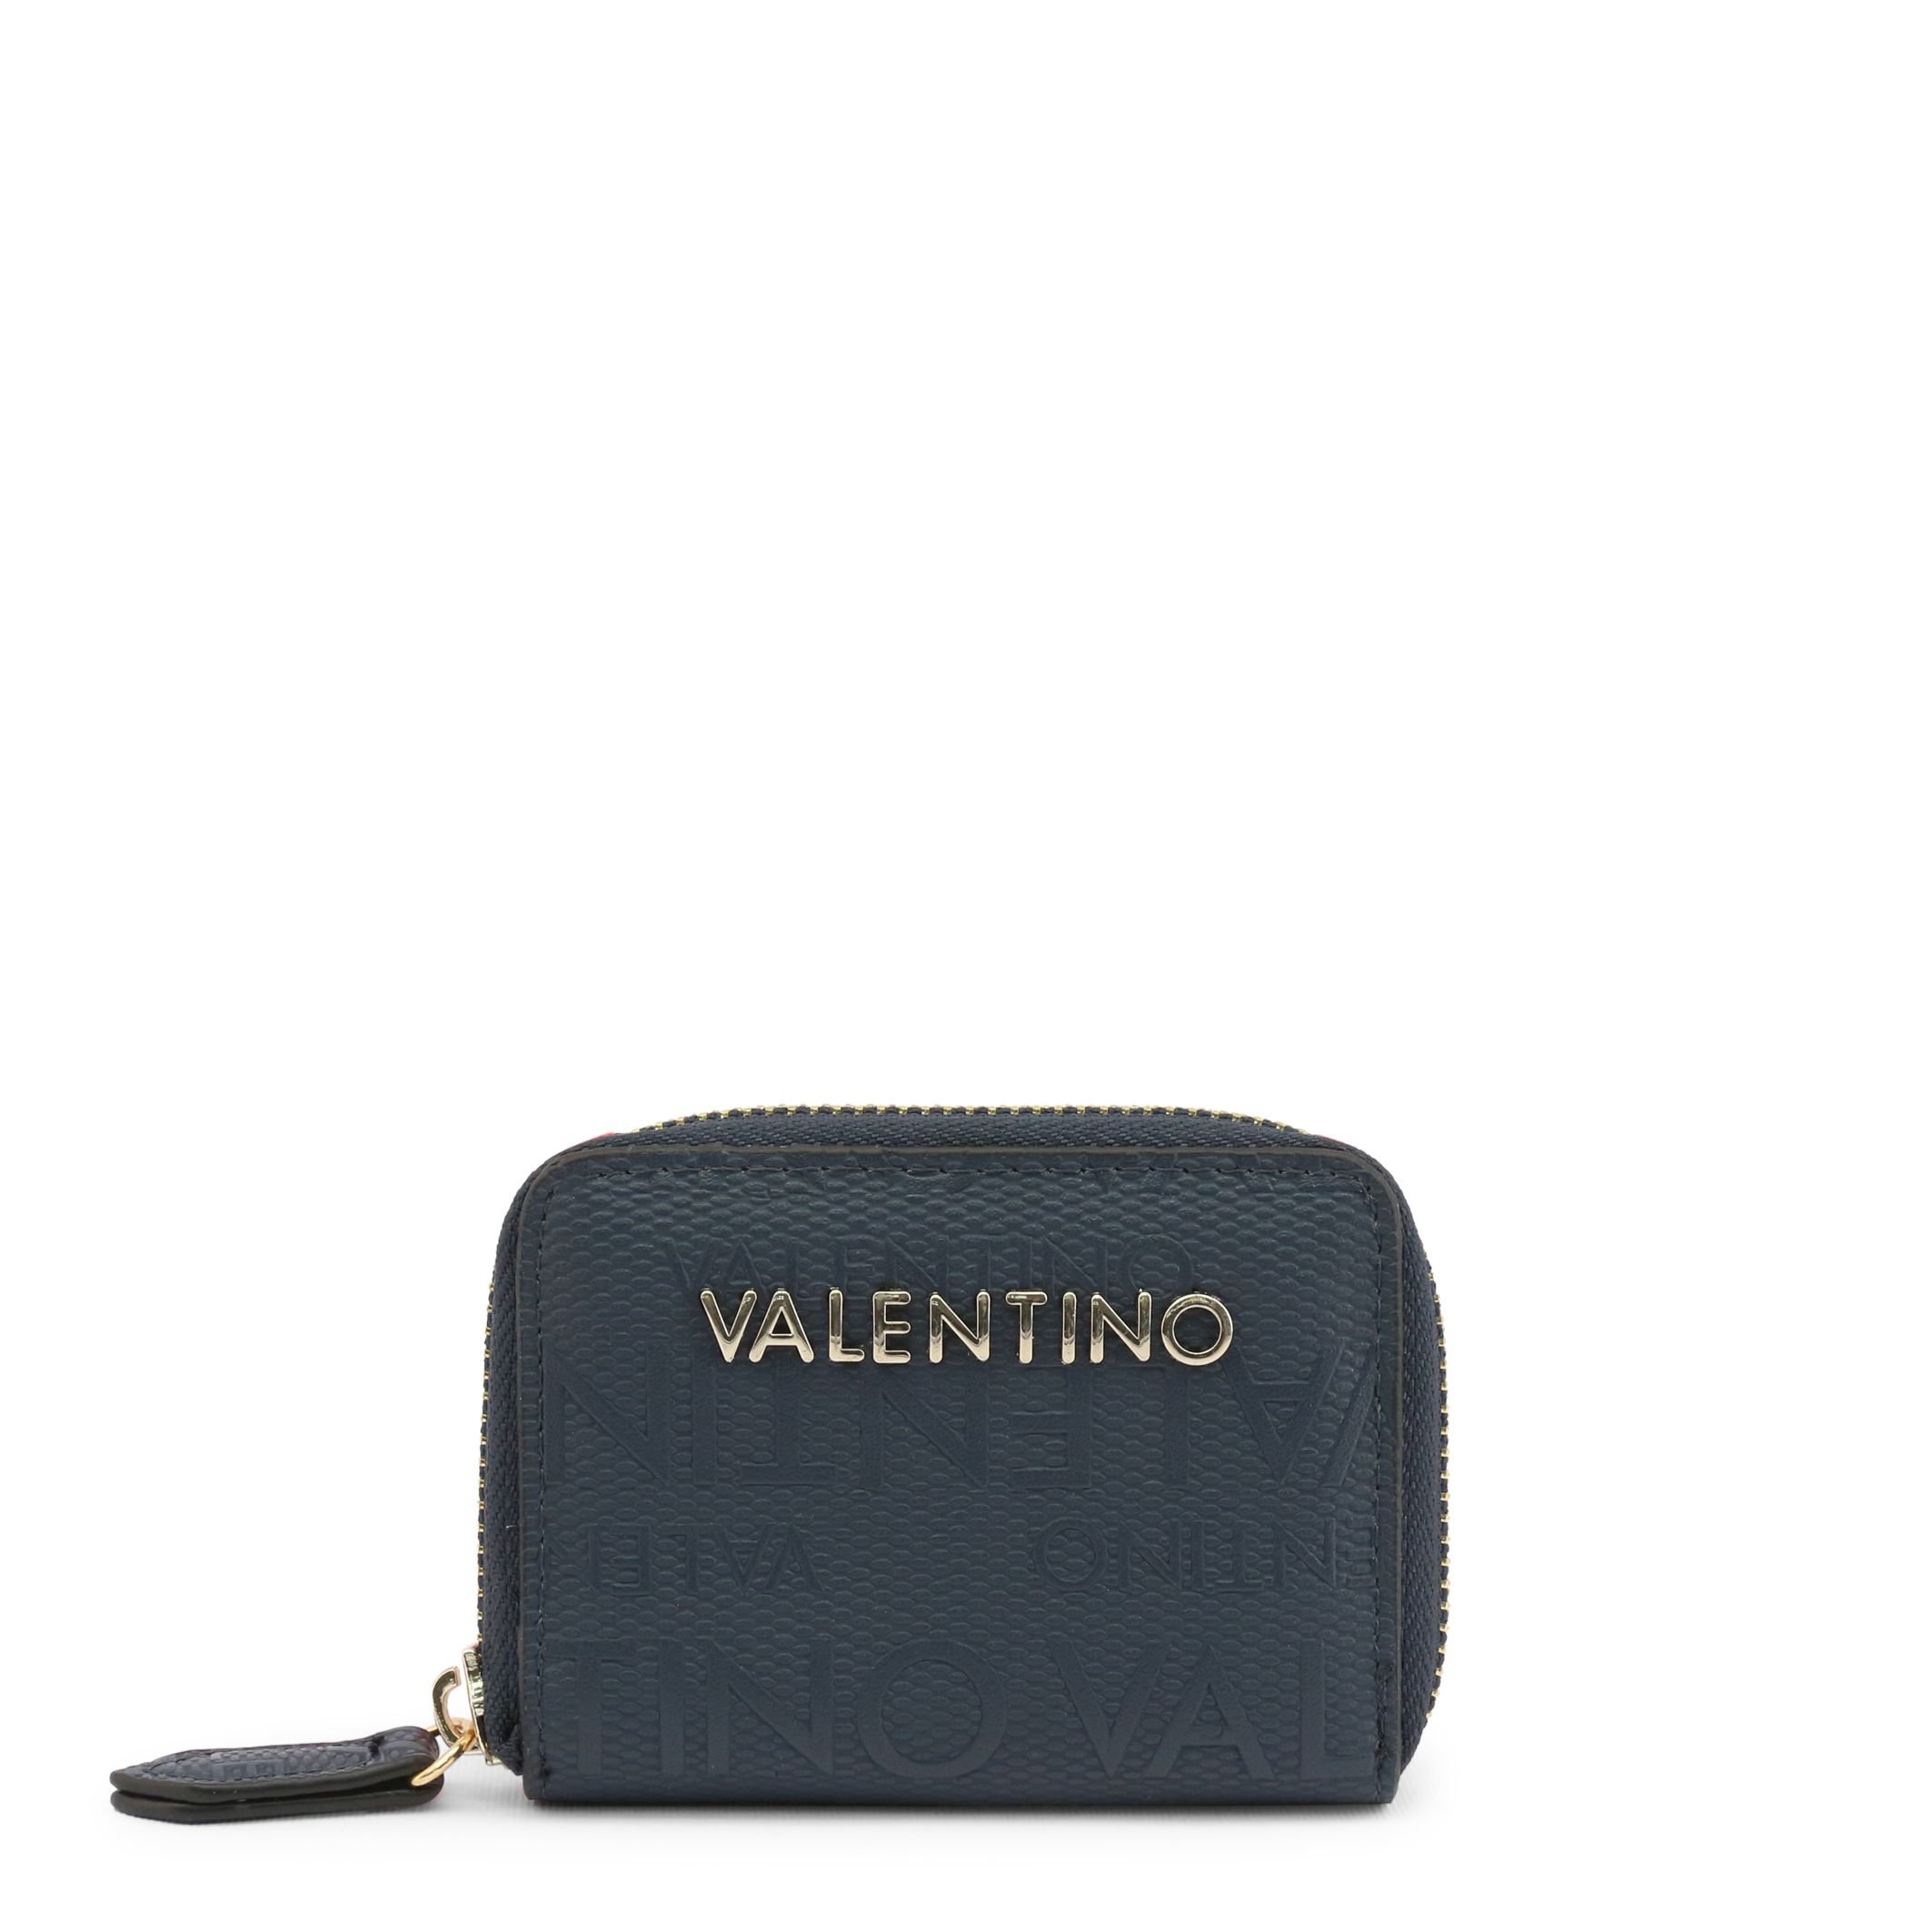 Valentino by Mario Valentino - WINTERDORY-VPS3MP139